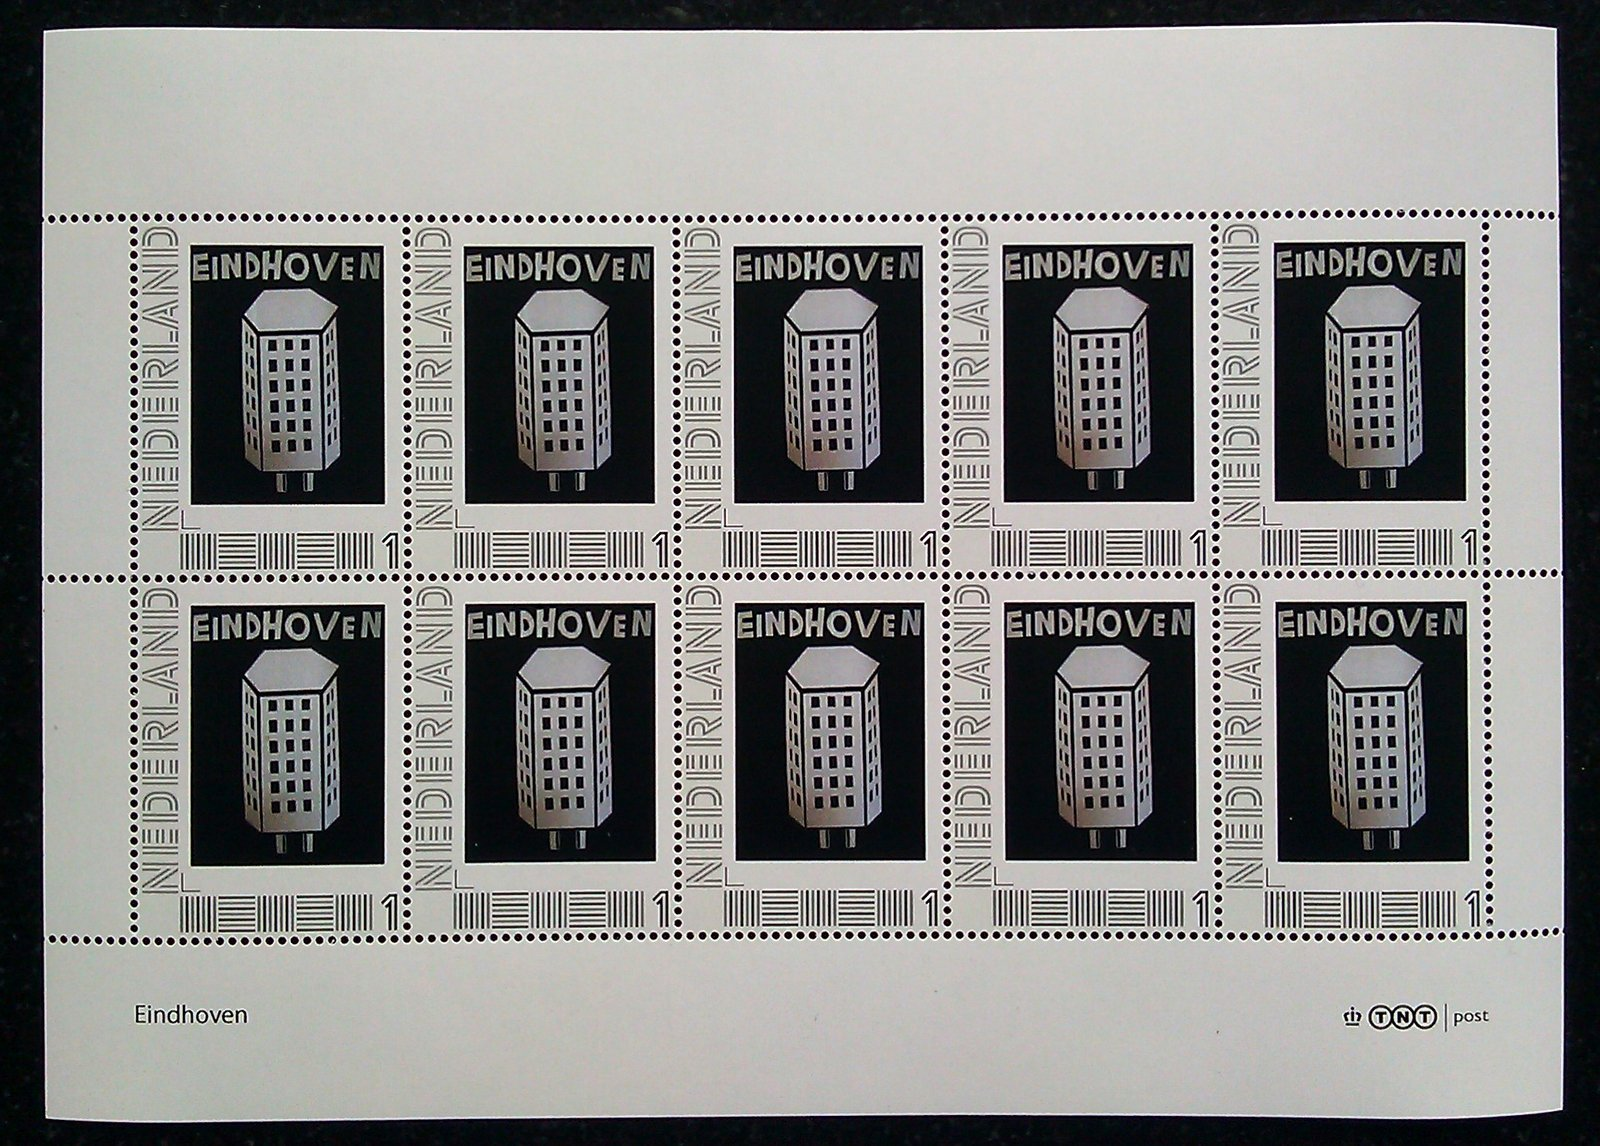 Velletje Postzegels Eindhoven